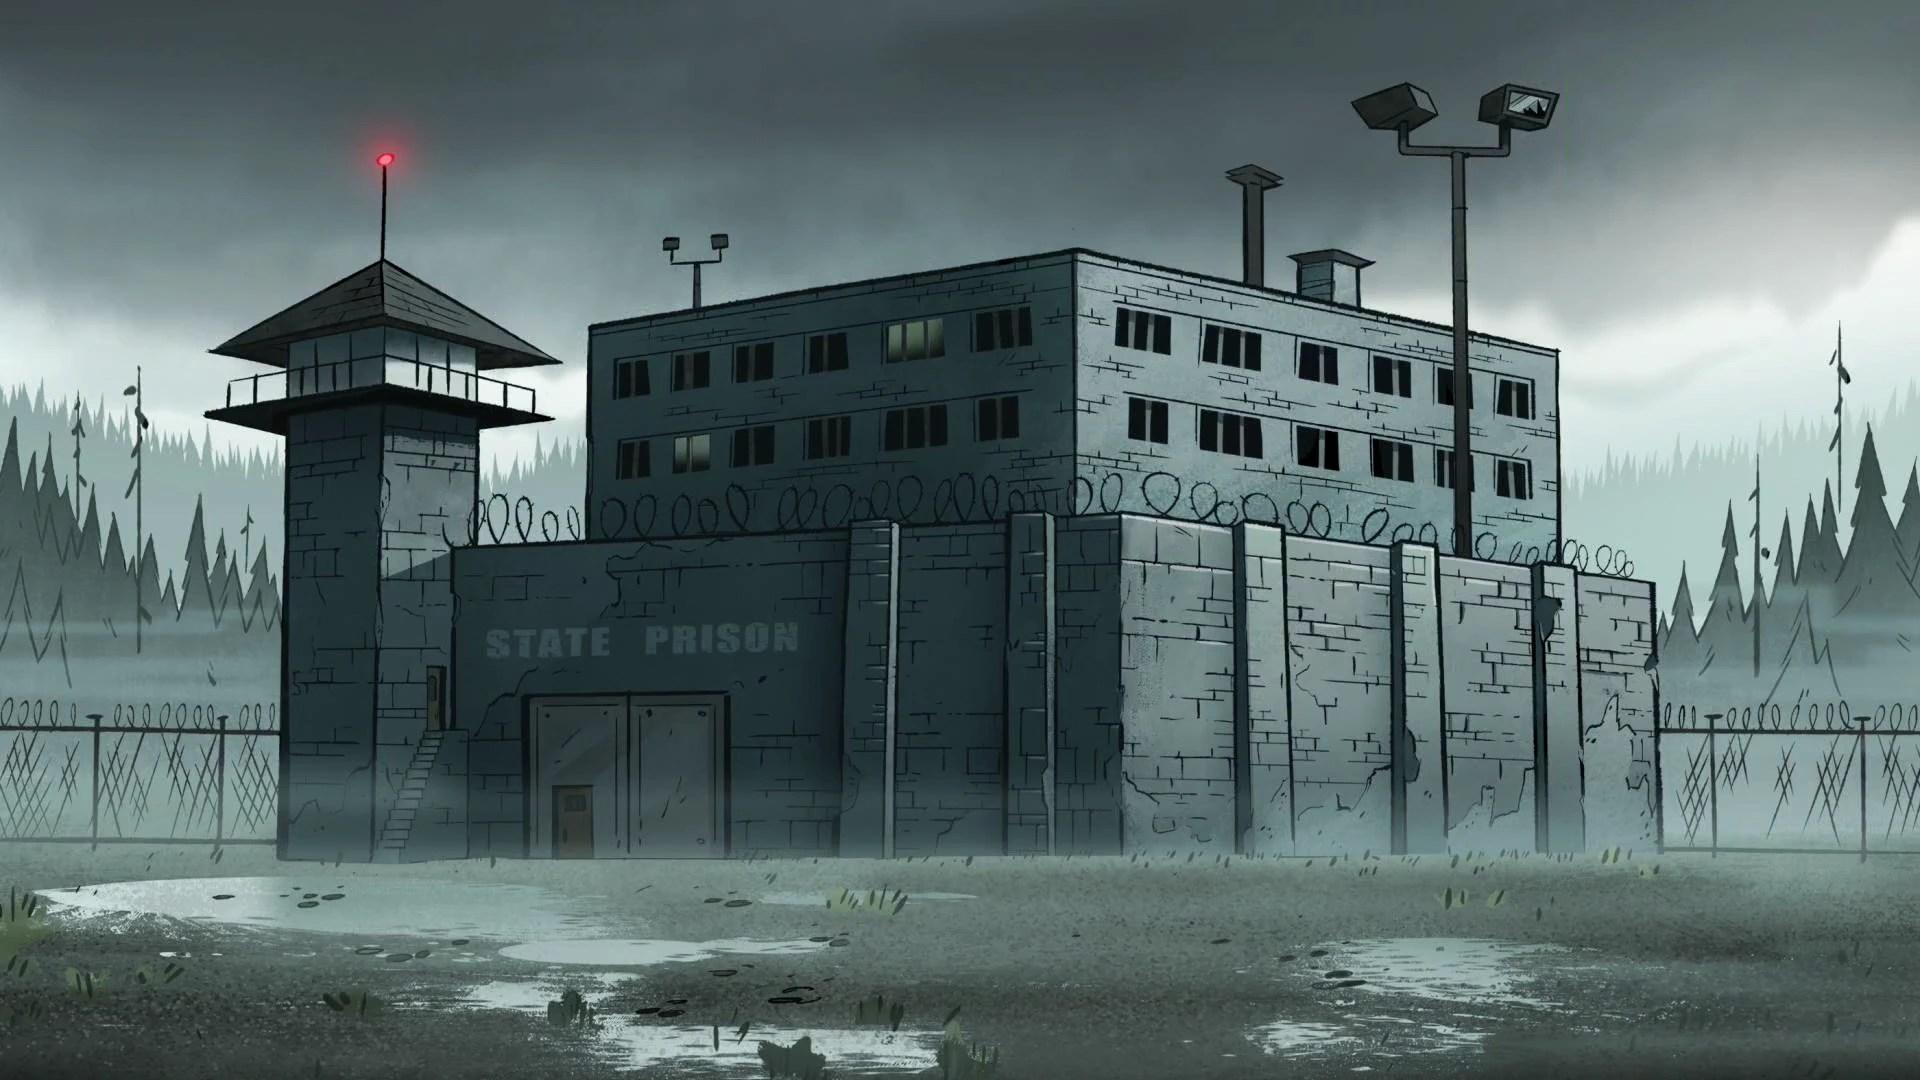 Candy Falls Live Wallpaper Gravity Falls Maximum Security Prison Gravity Falls Wiki